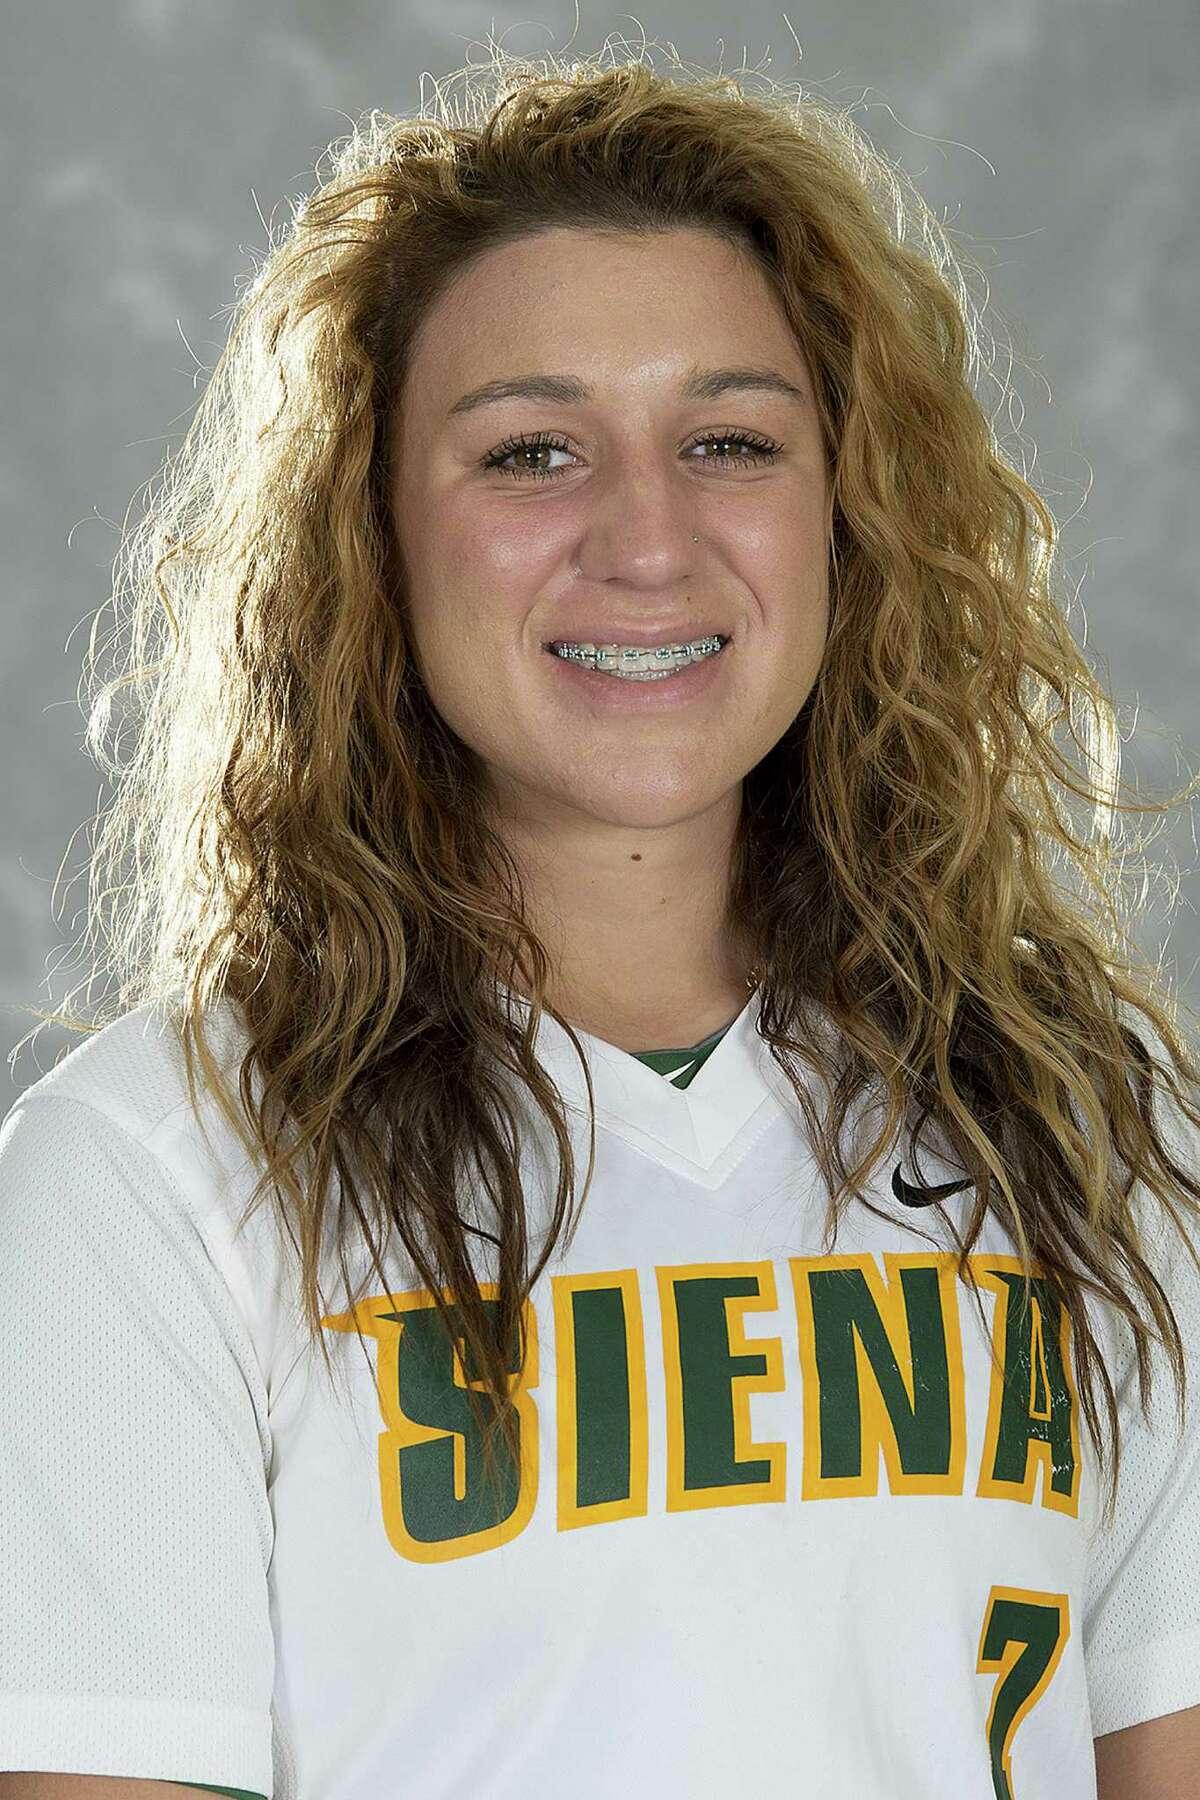 Bethlehem High graduate Sammy Smaldone of the Siena College softball team. (Siena College sports information)